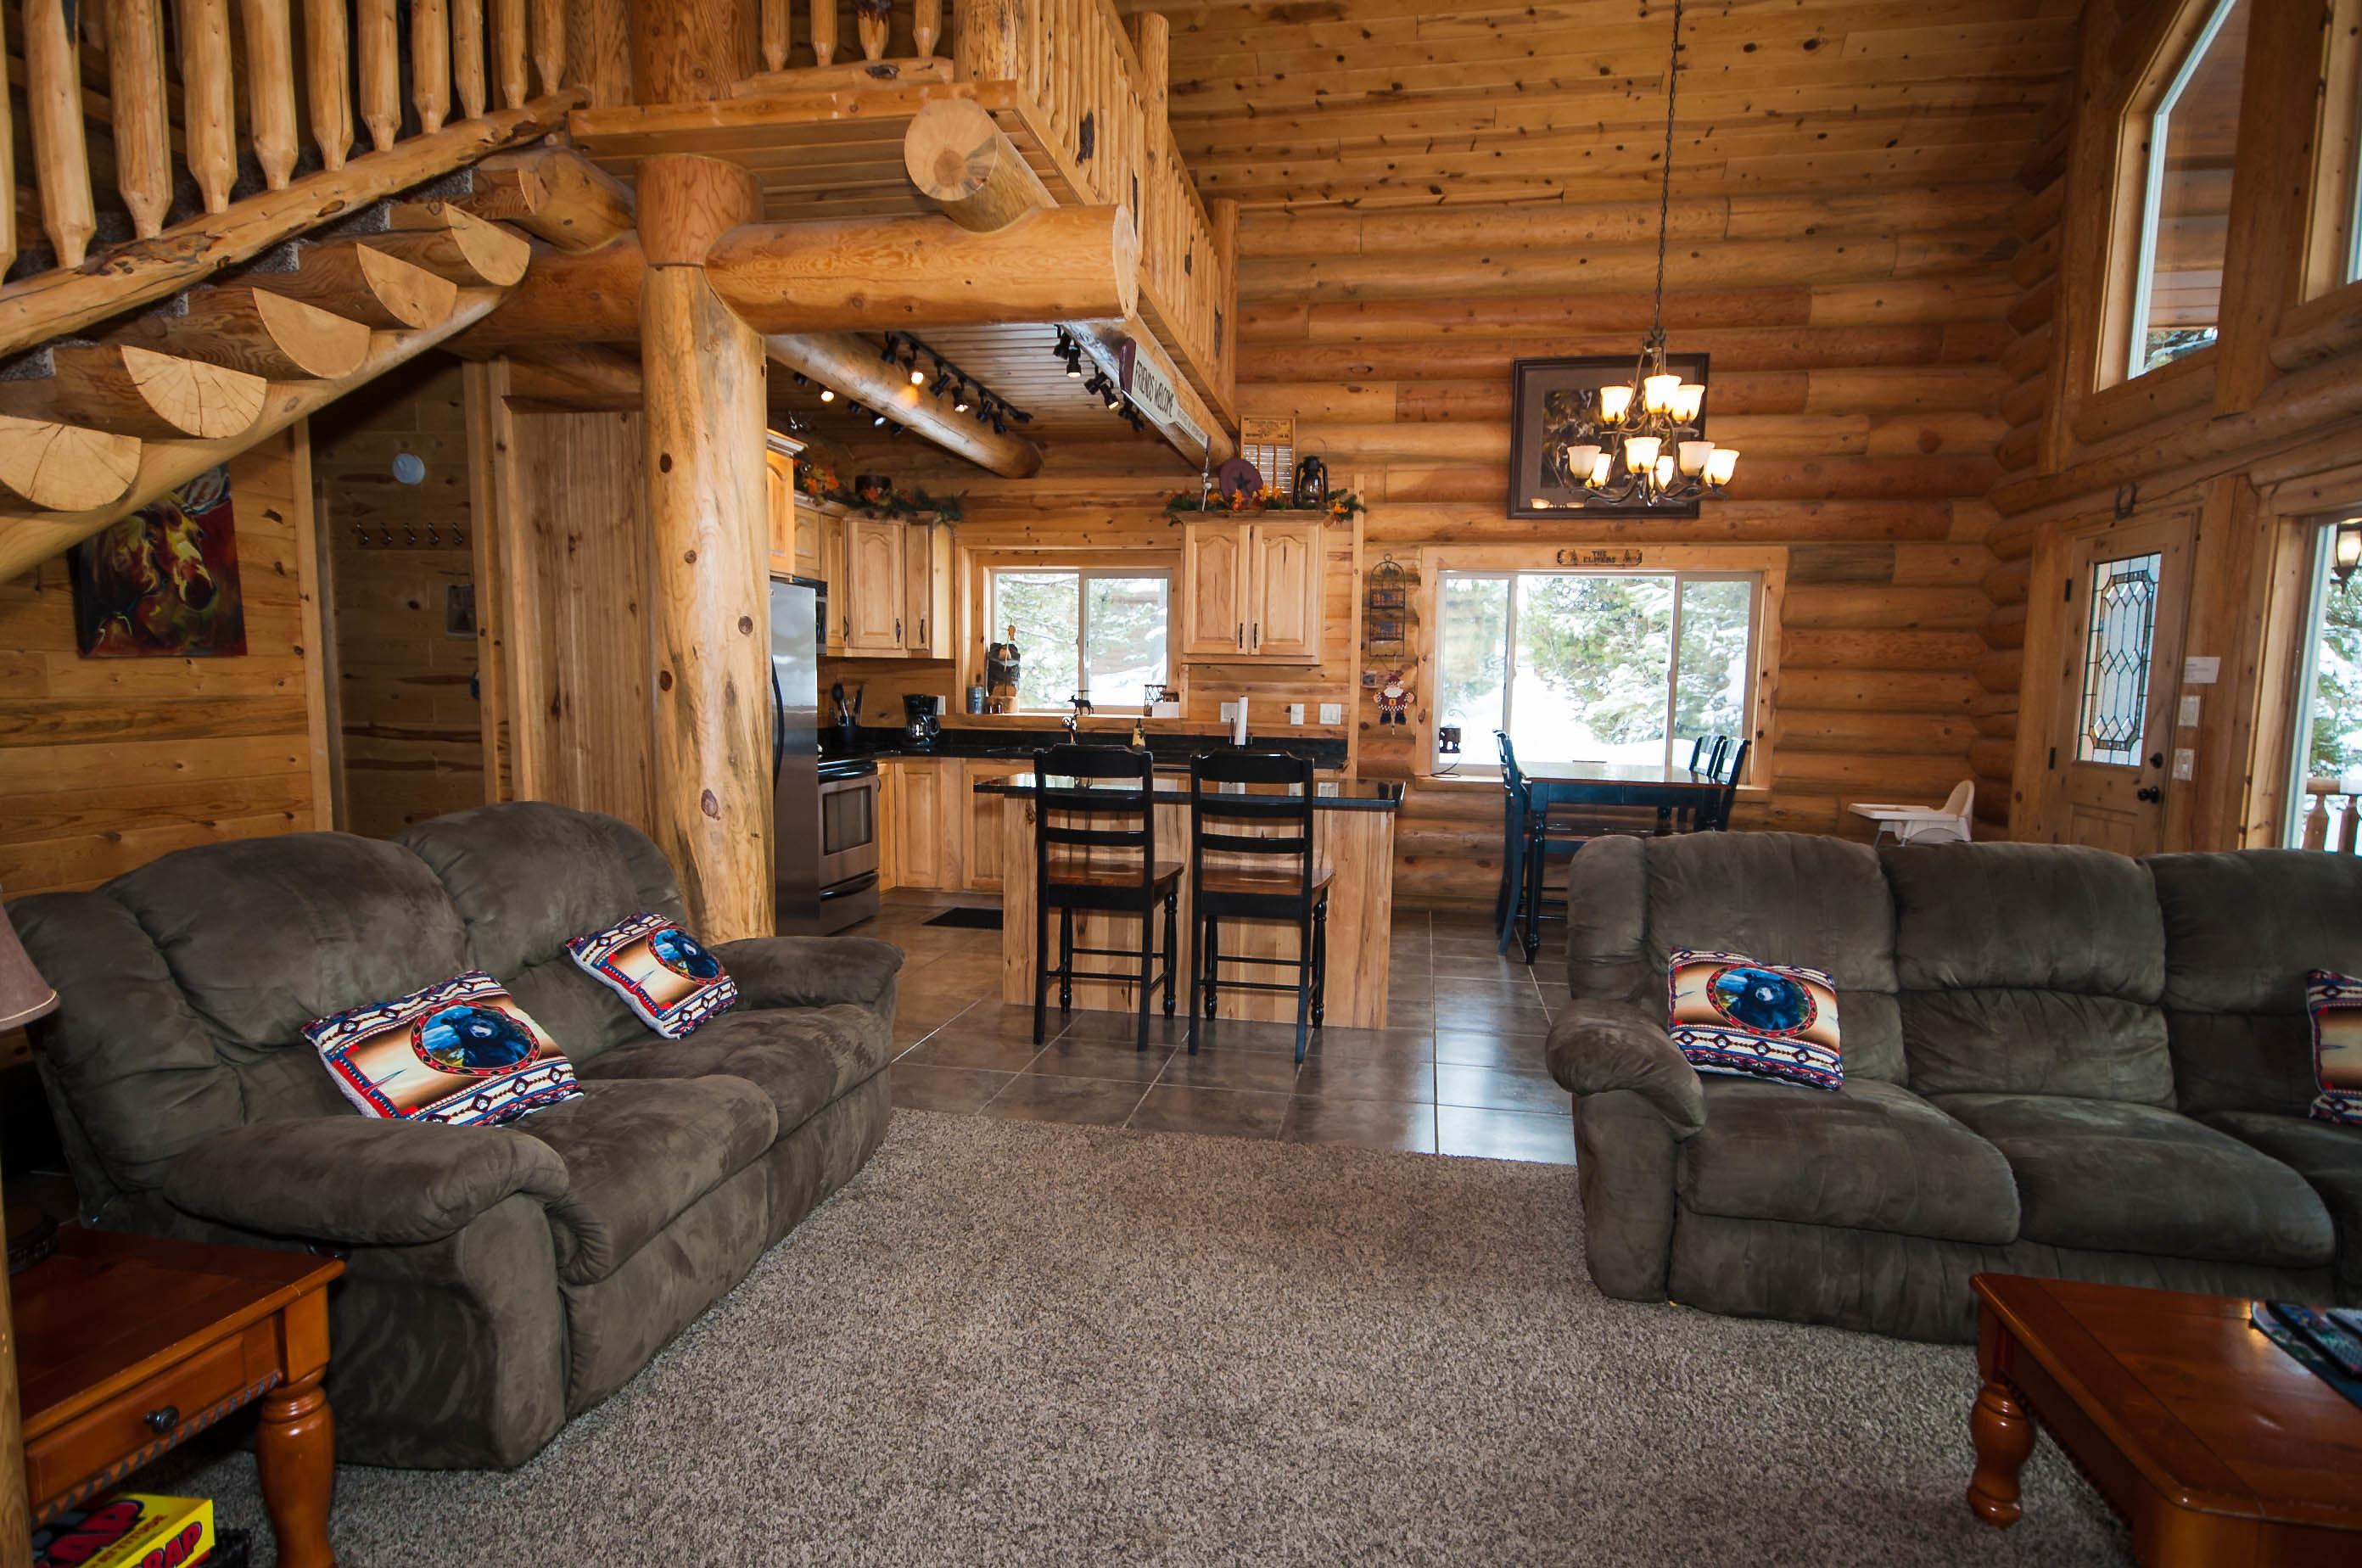 2. C24 Living Room